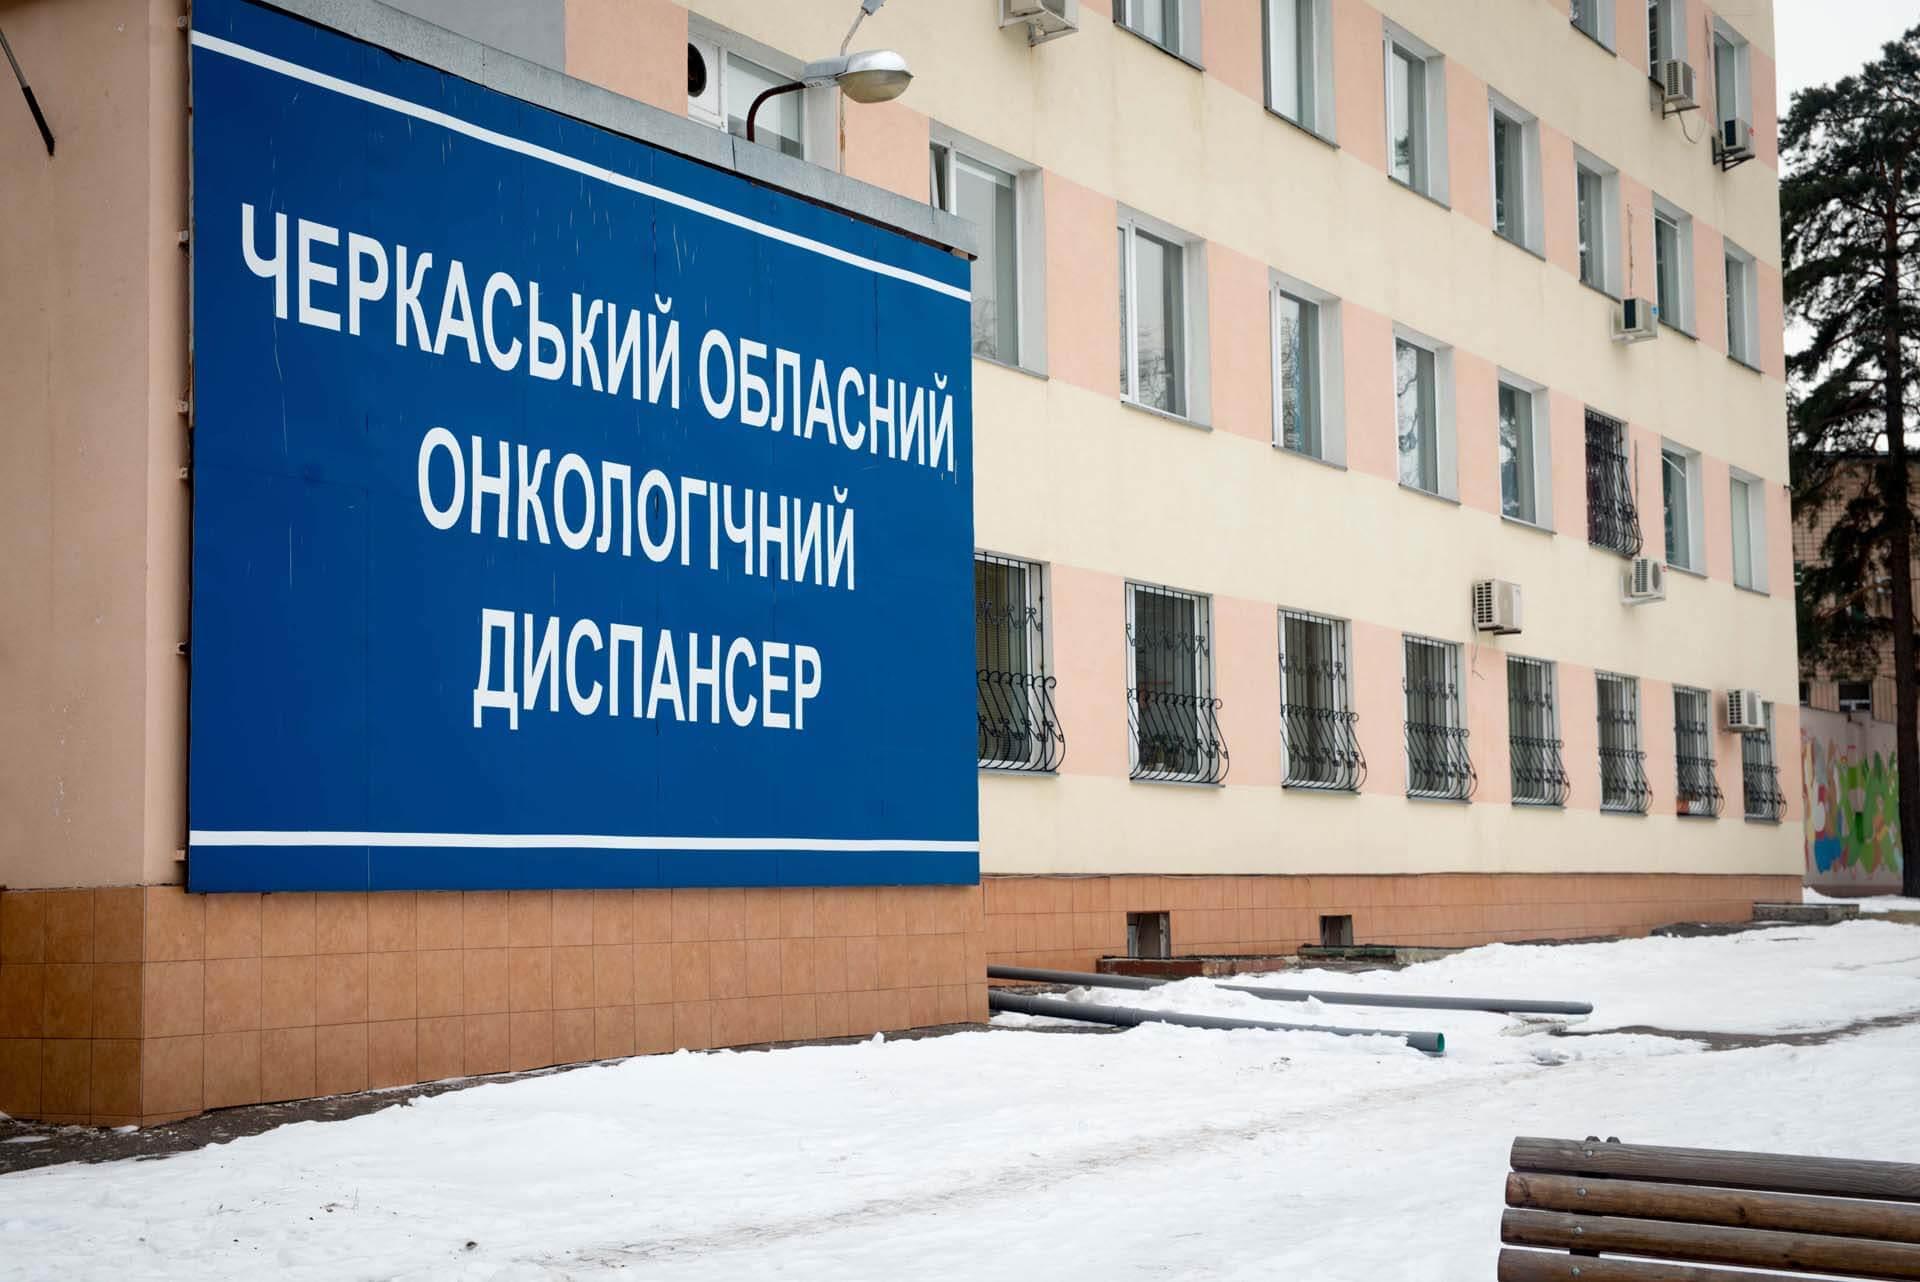 https://gematolog.ck.ua/wp-content/uploads/2015/12/onko2.jpg